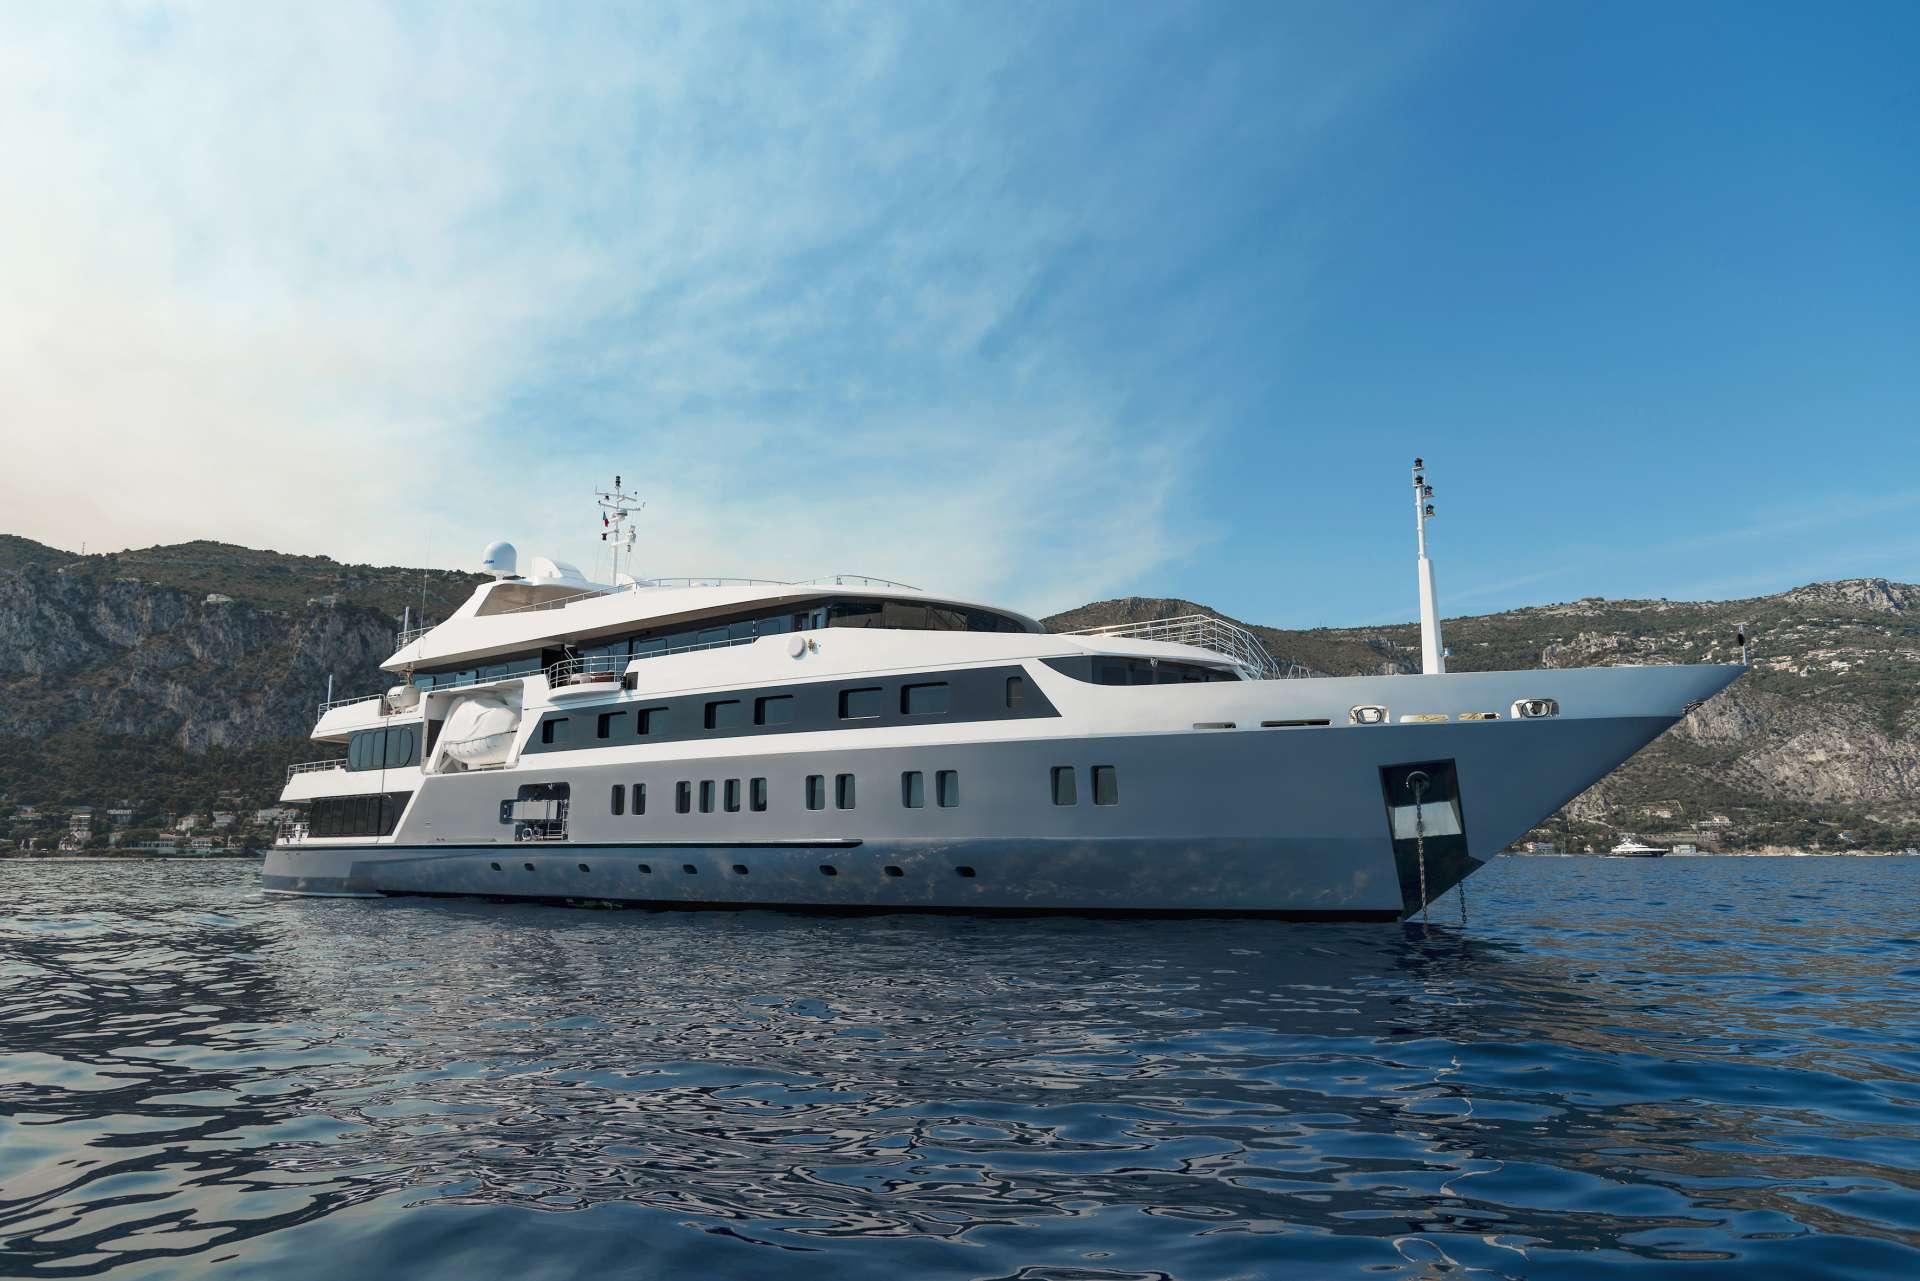 Power Yacht 'Power', 30 PAX, 30 Crew, 236.00 Ft, 72.00 Meters, Built 2004, Austal/Oceanfast, Refit Year 2017